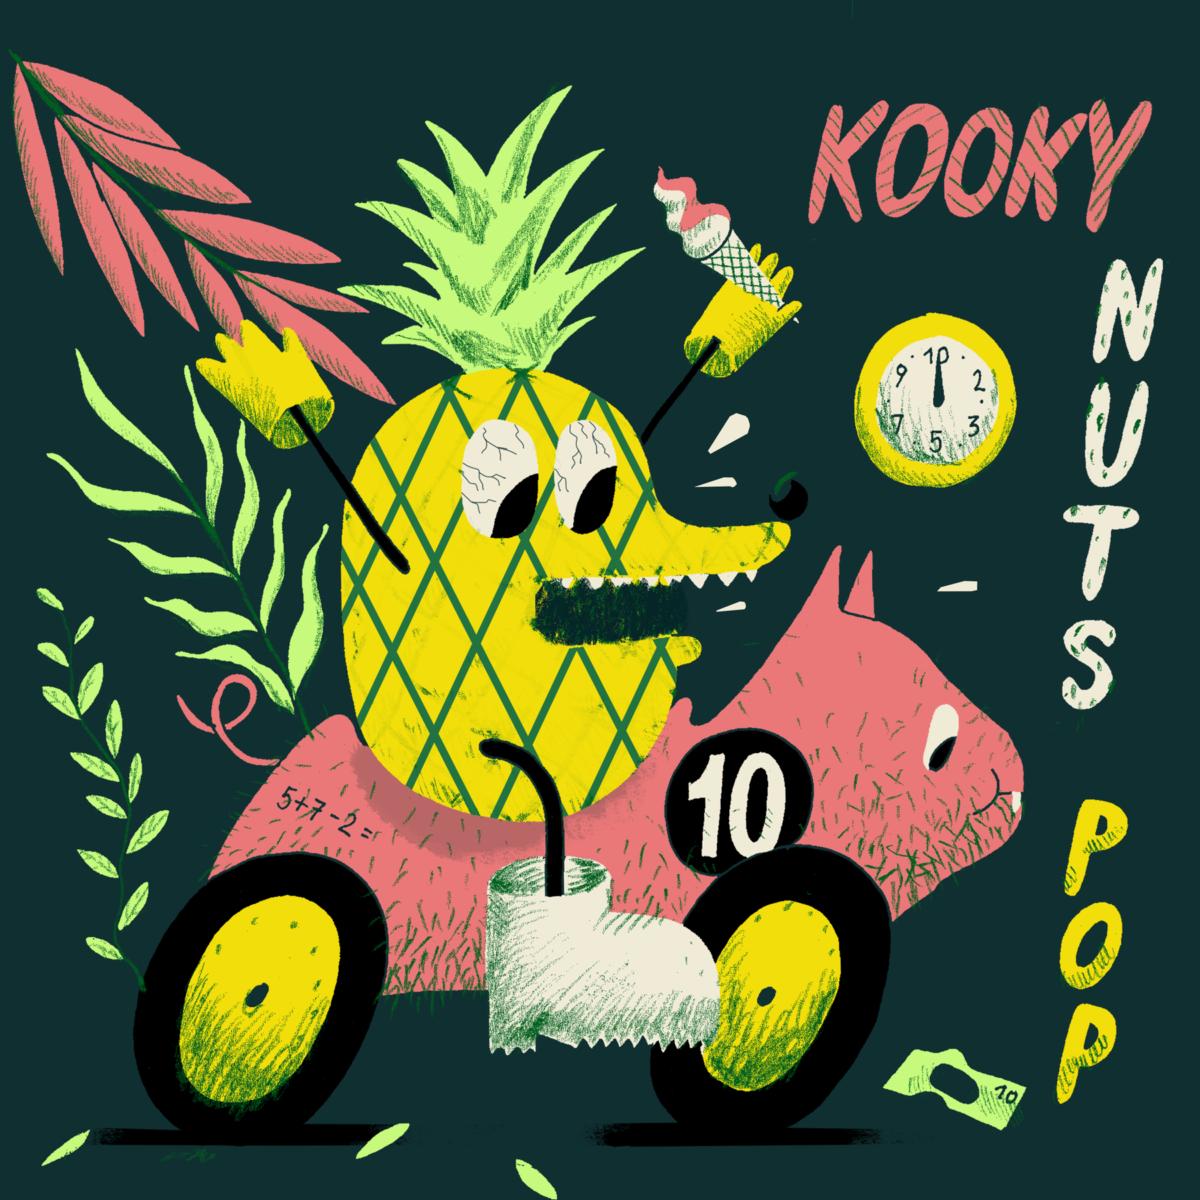 V/A: Kooky Nuts Pop (Darling Dada MP3)